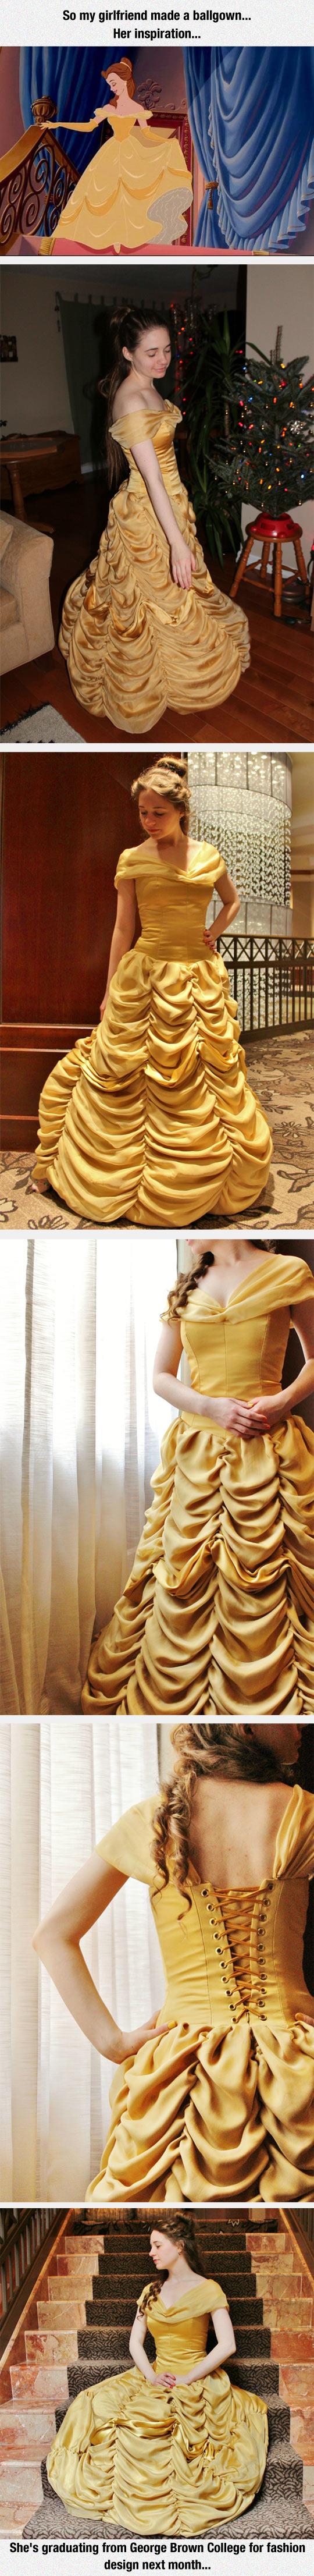 Amazing Dress Inspired By A Disney Princess